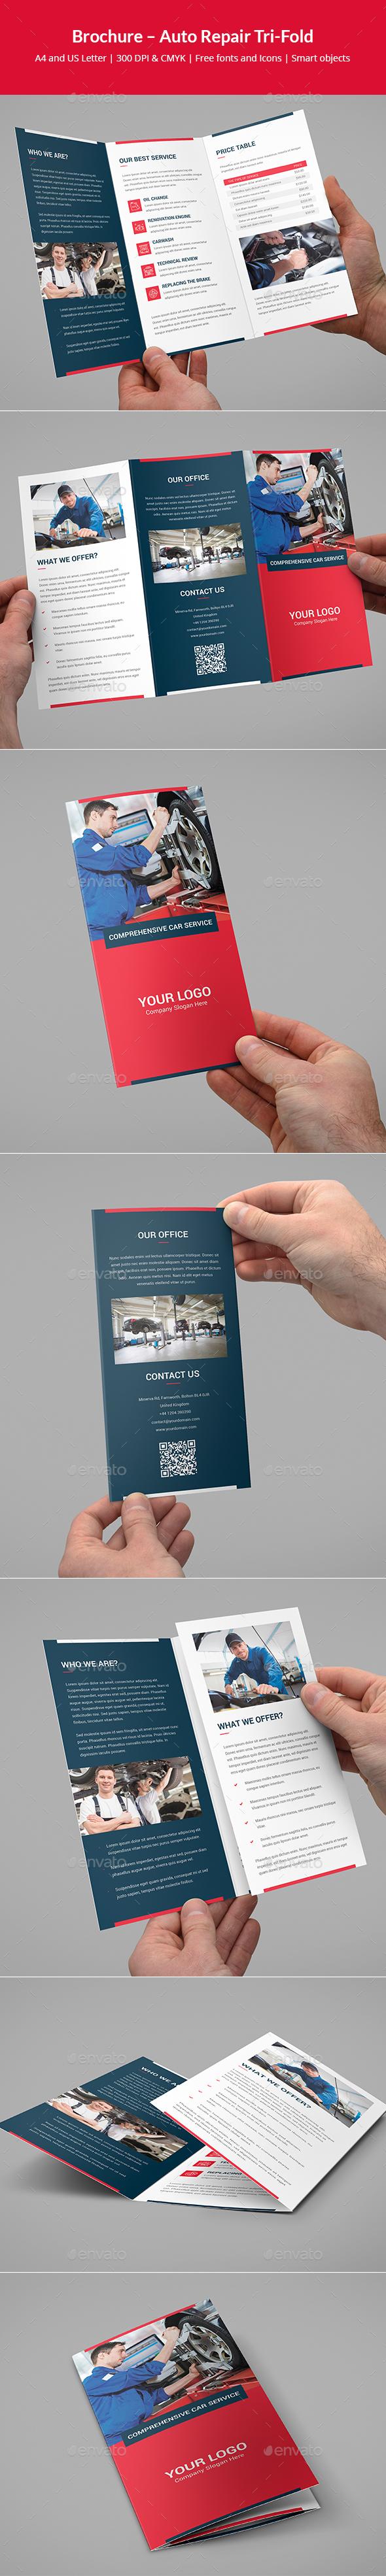 Brochure – Auto Repair Tri-Fold - Corporate Brochures